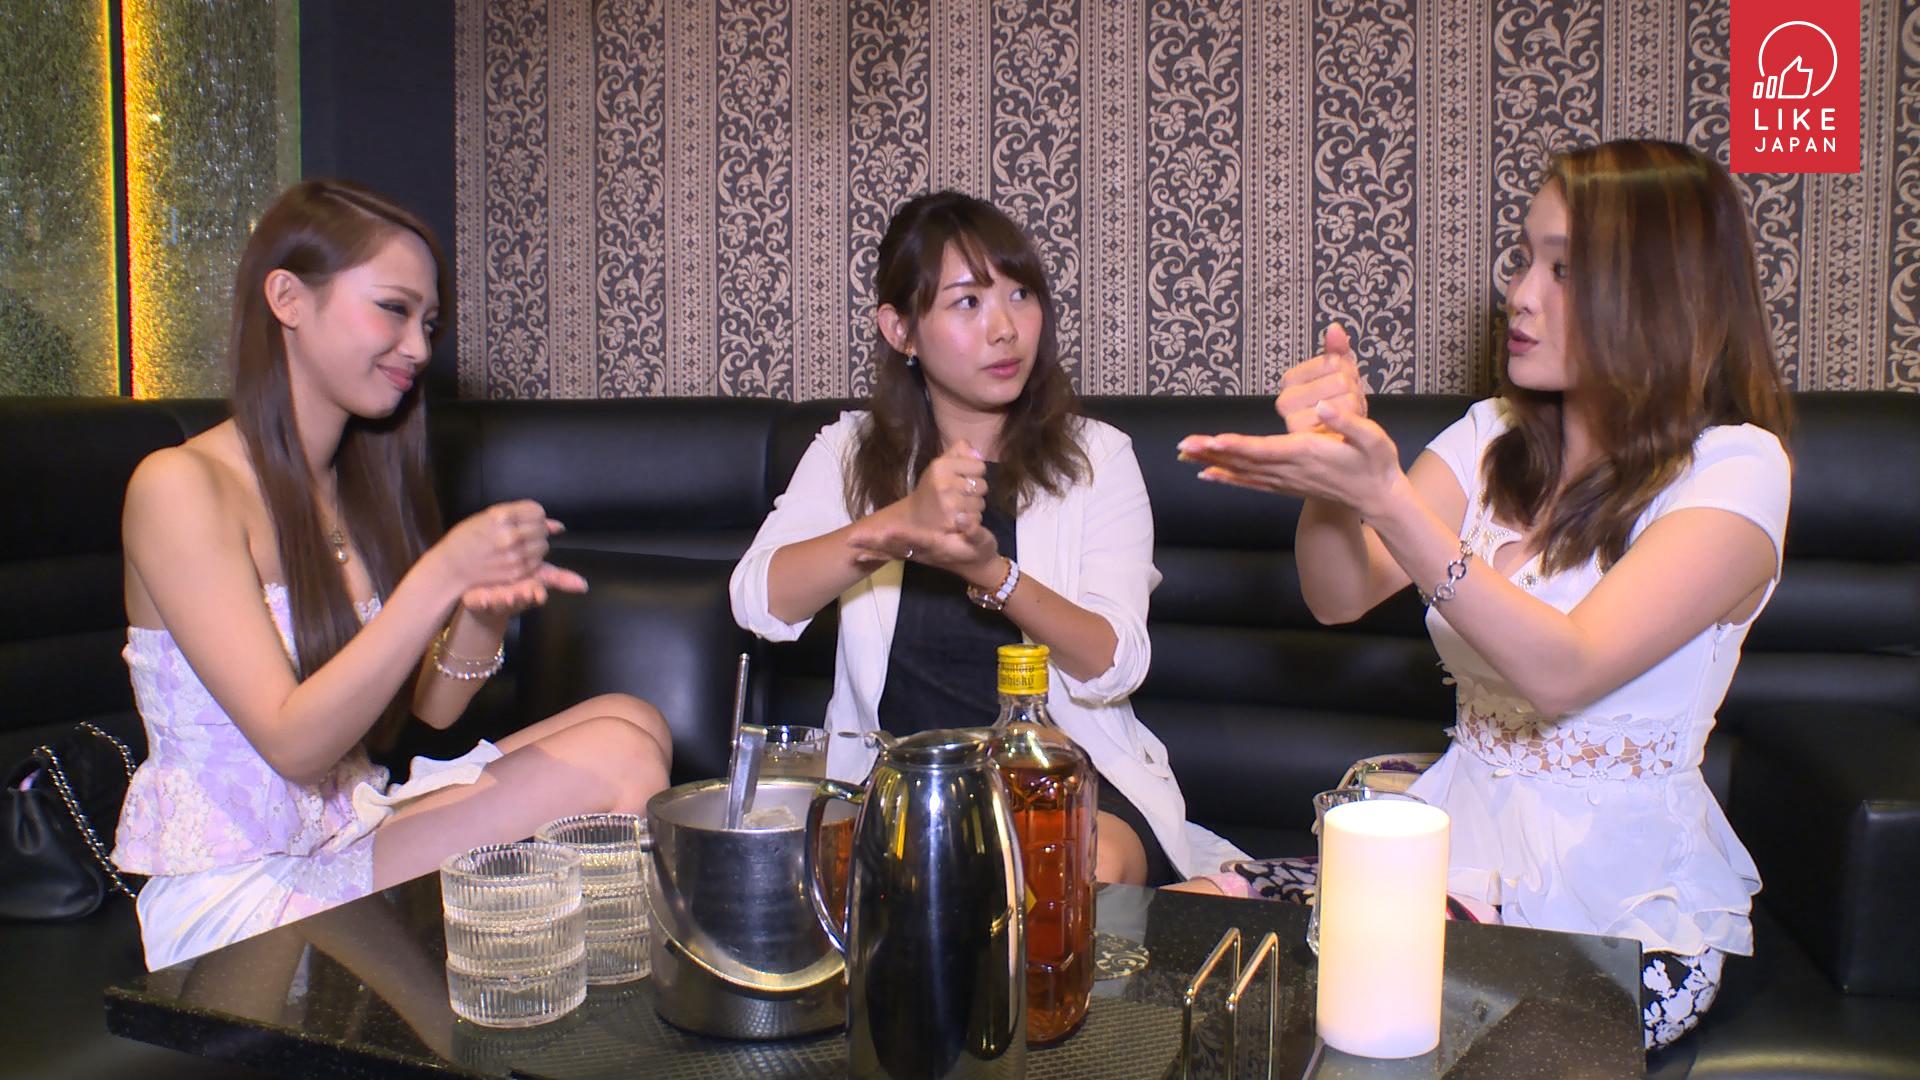 【Like Japan放送室】新宿陪酒女郎教你夜總會小知識!